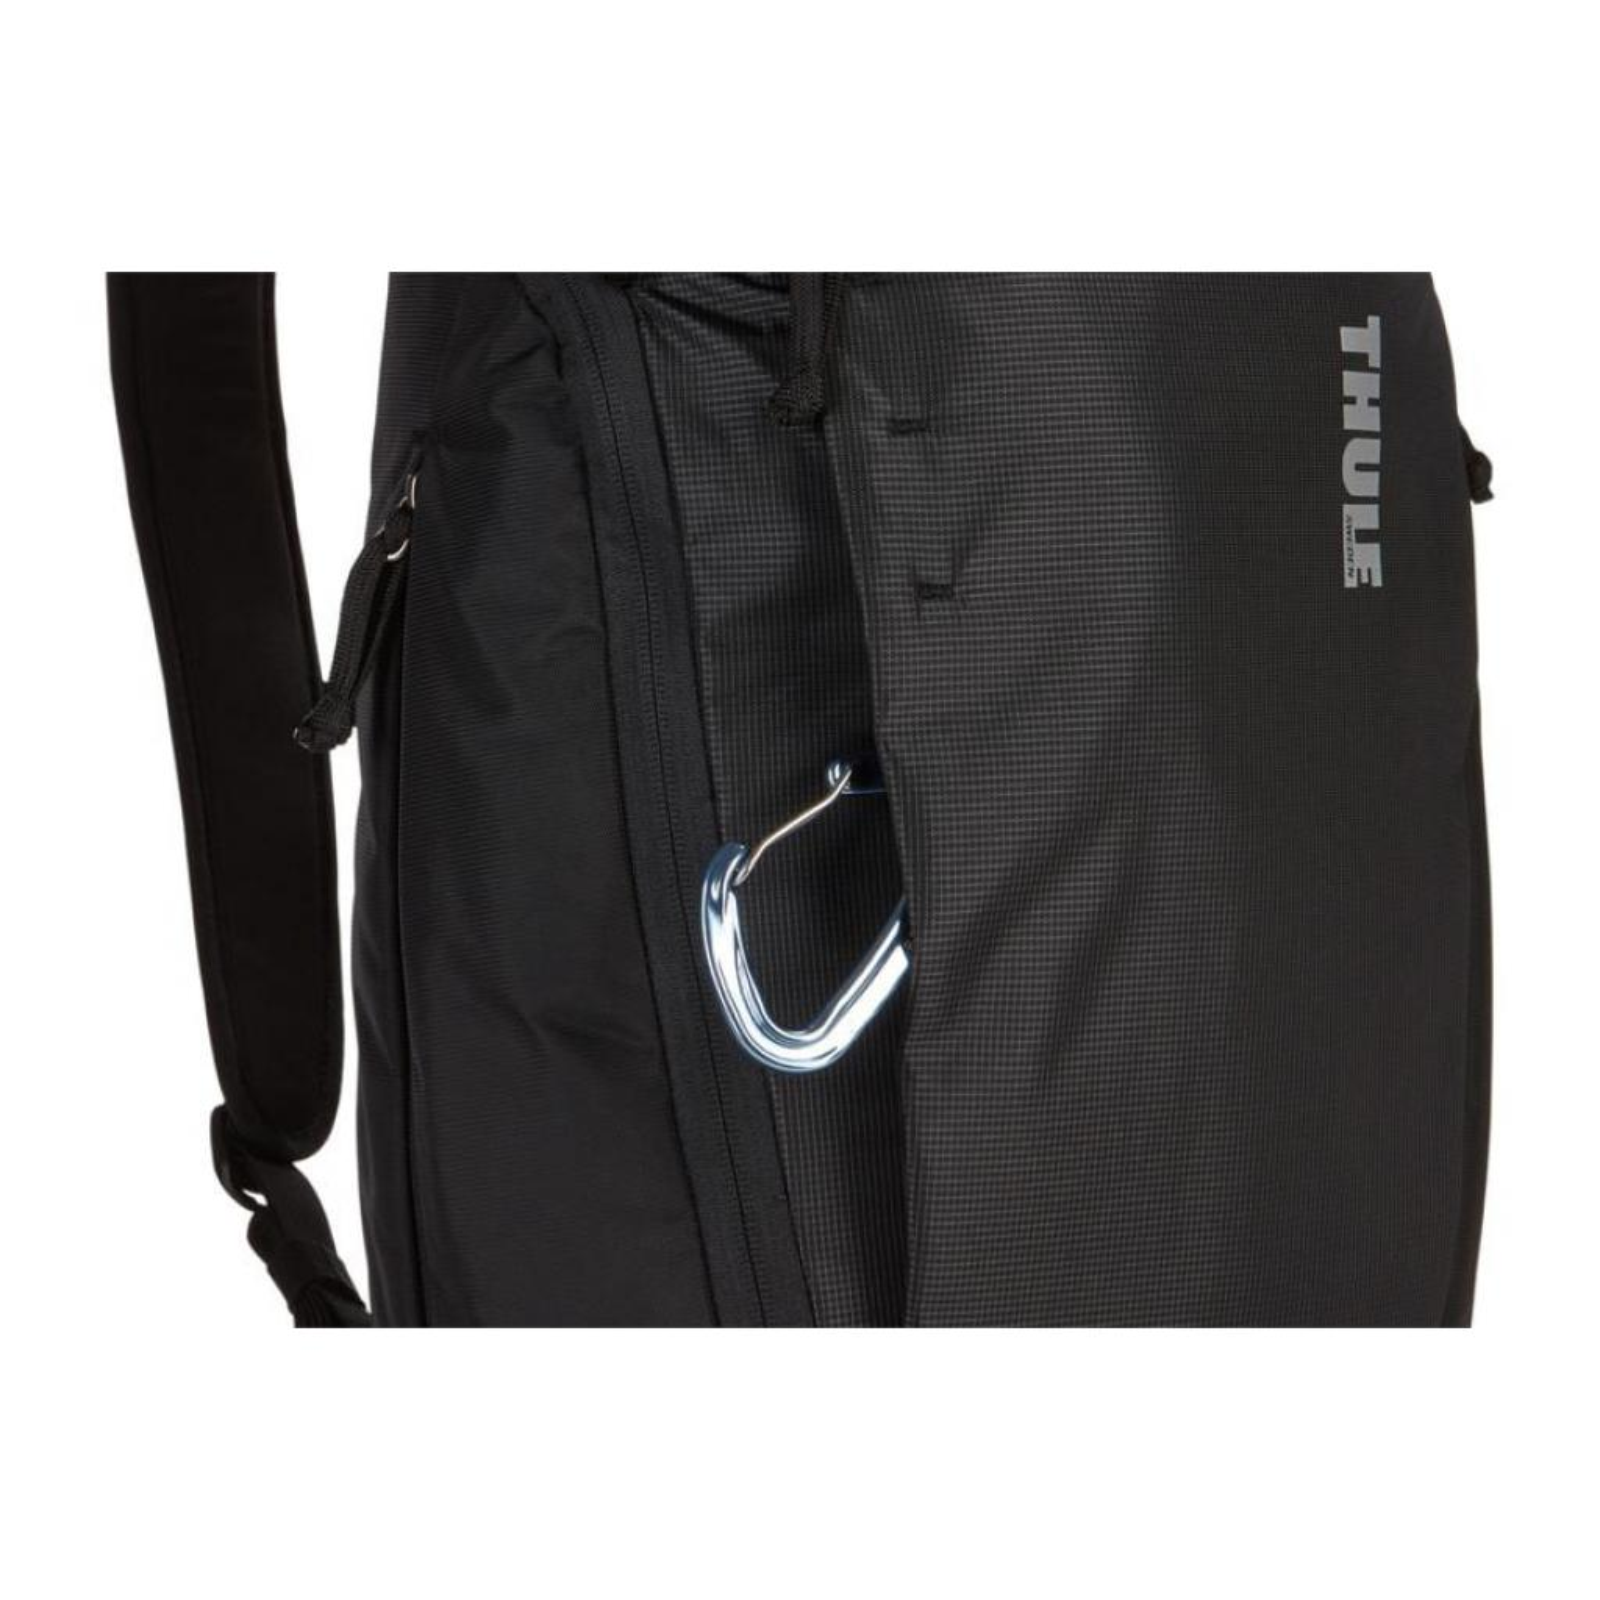 "Рюкзак для ноутбука Thule 15.6"" EnRoute 23L TEBP-316 Asphalt (3203830) изображение 10"